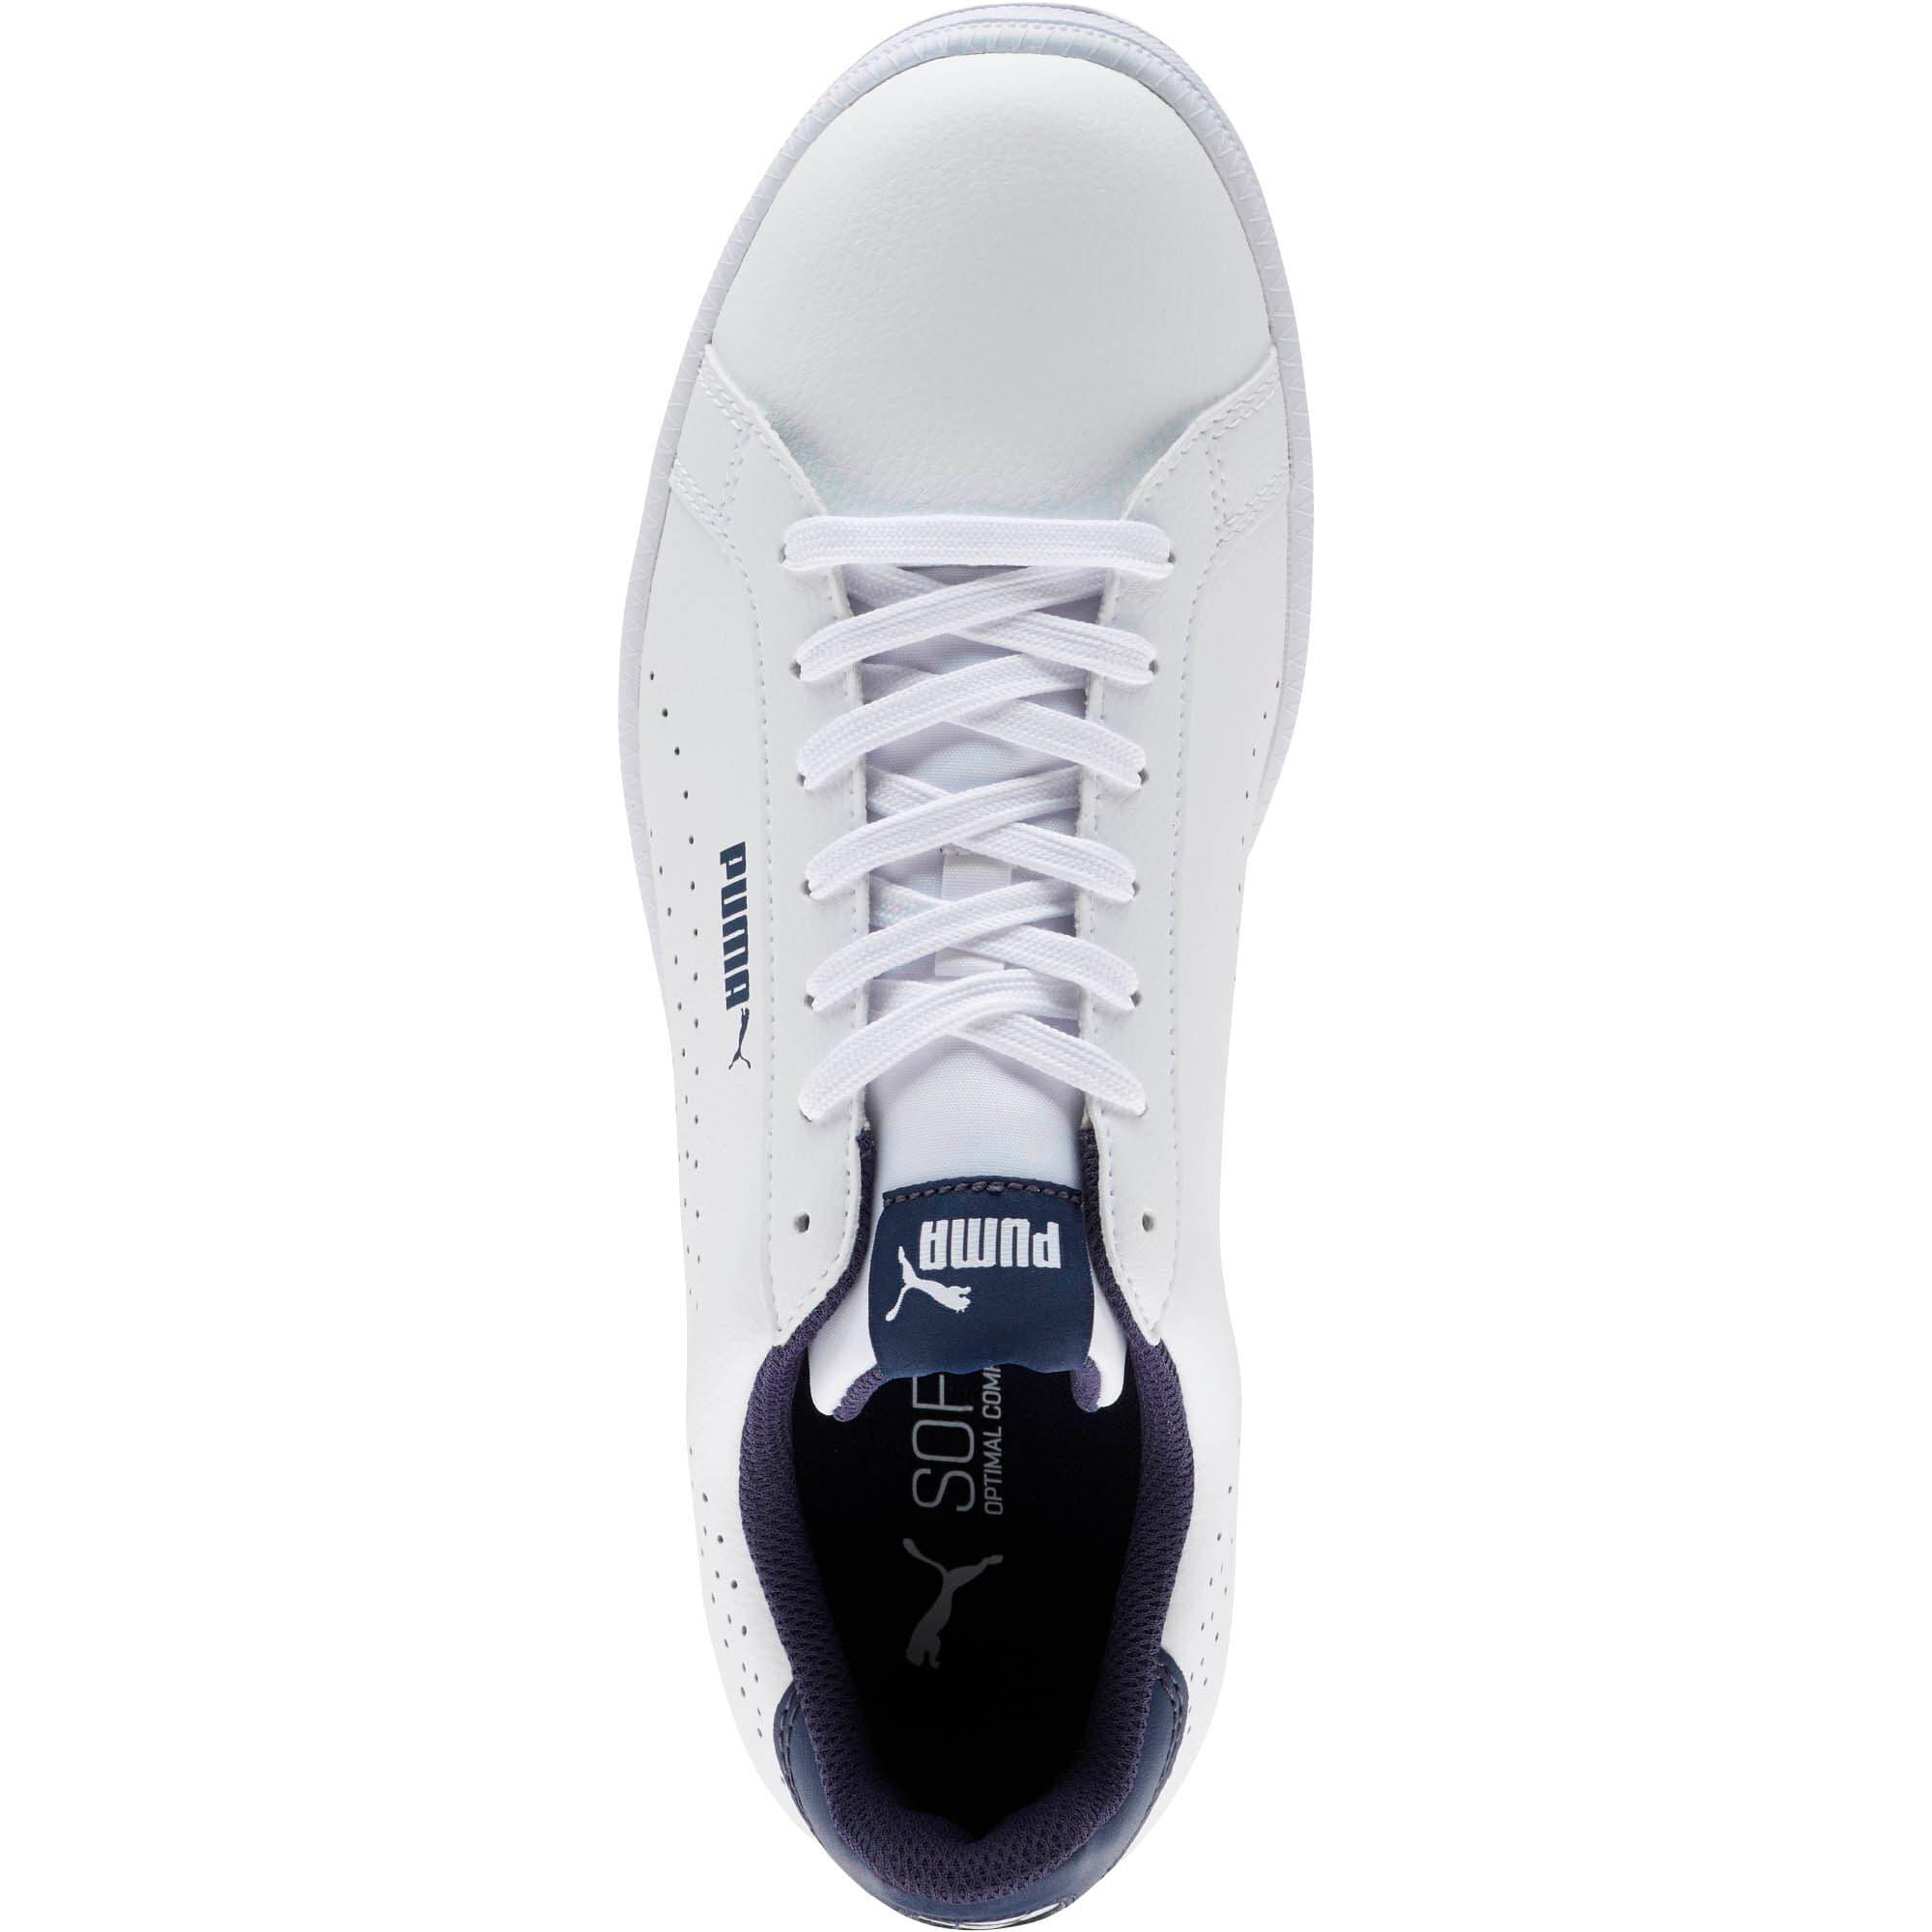 Thumbnail 5 of PUMA Smash Perf Sneakers, Puma White-Peacoat, medium